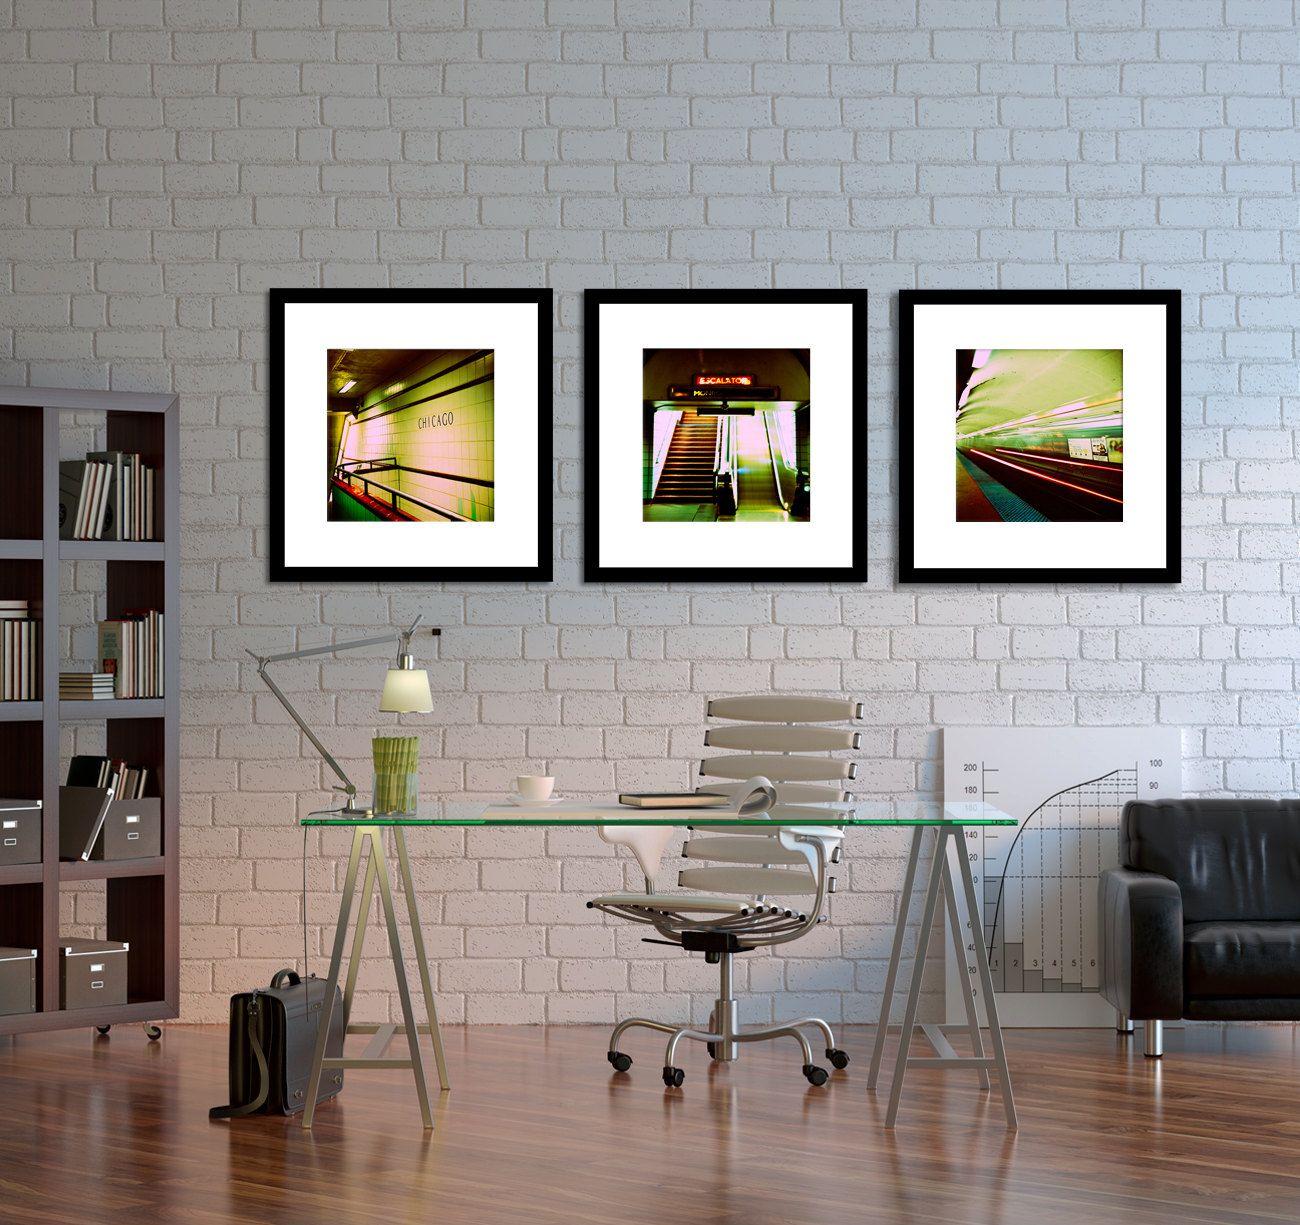 High Resolution Home Office Wall Decor #4 Office Vinyl